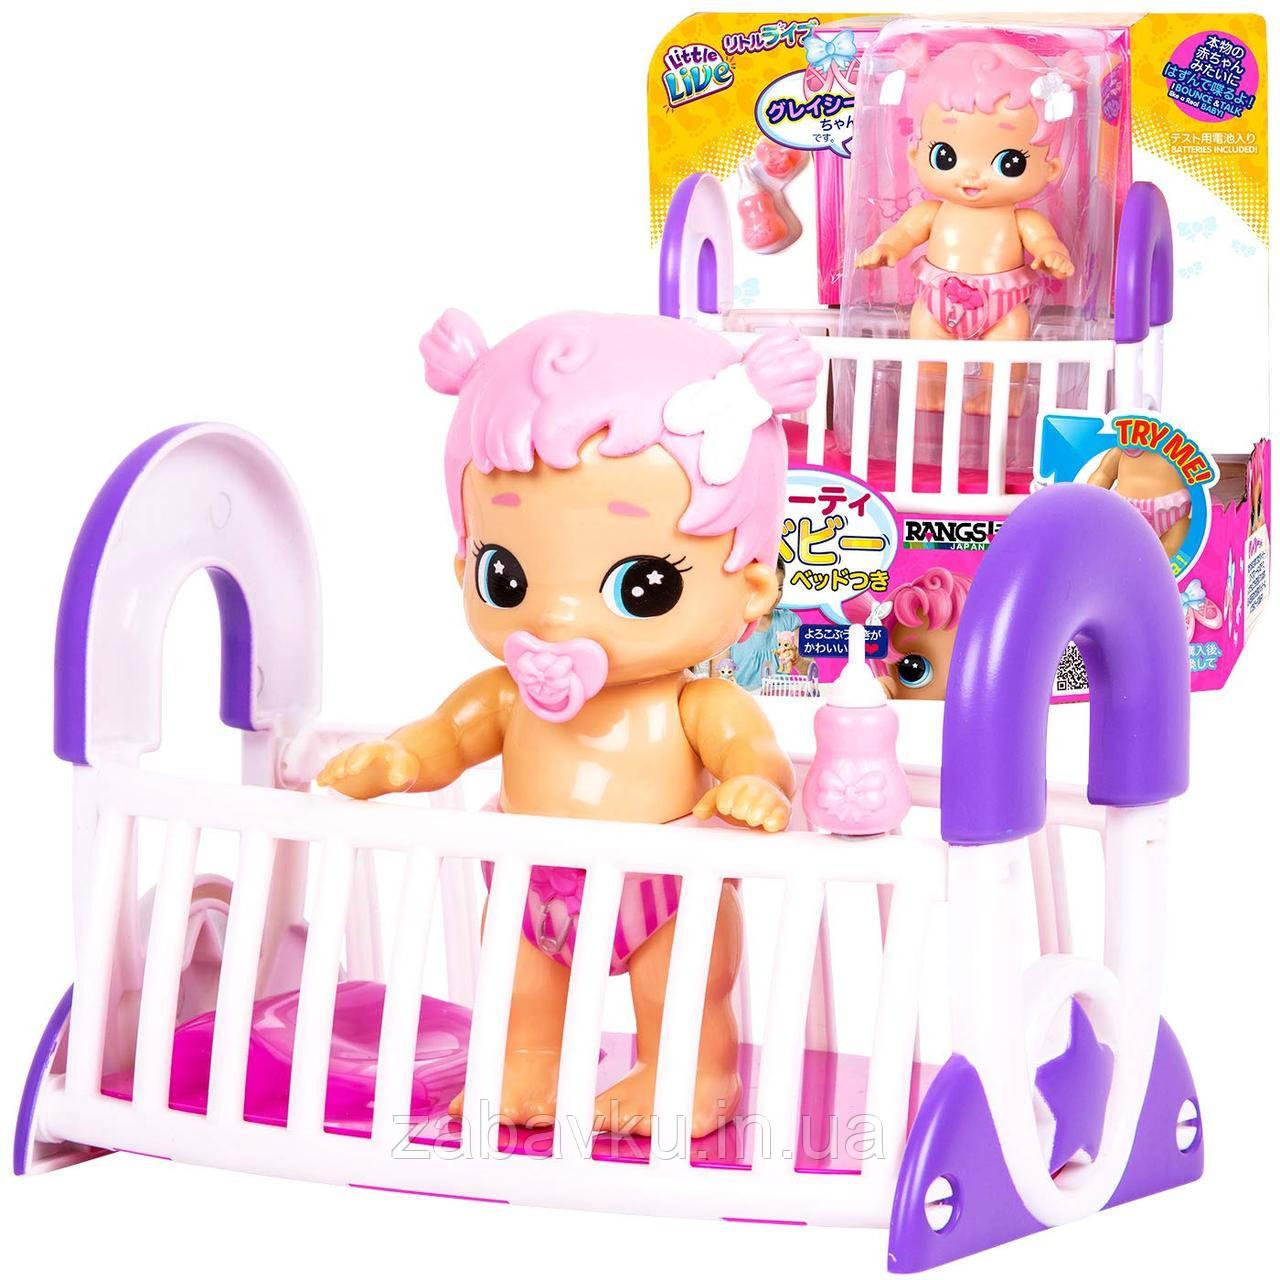 Little Live Bizzy Bubs Bouncing Baby Gracie Бізі Бабс інтерактивний пупс